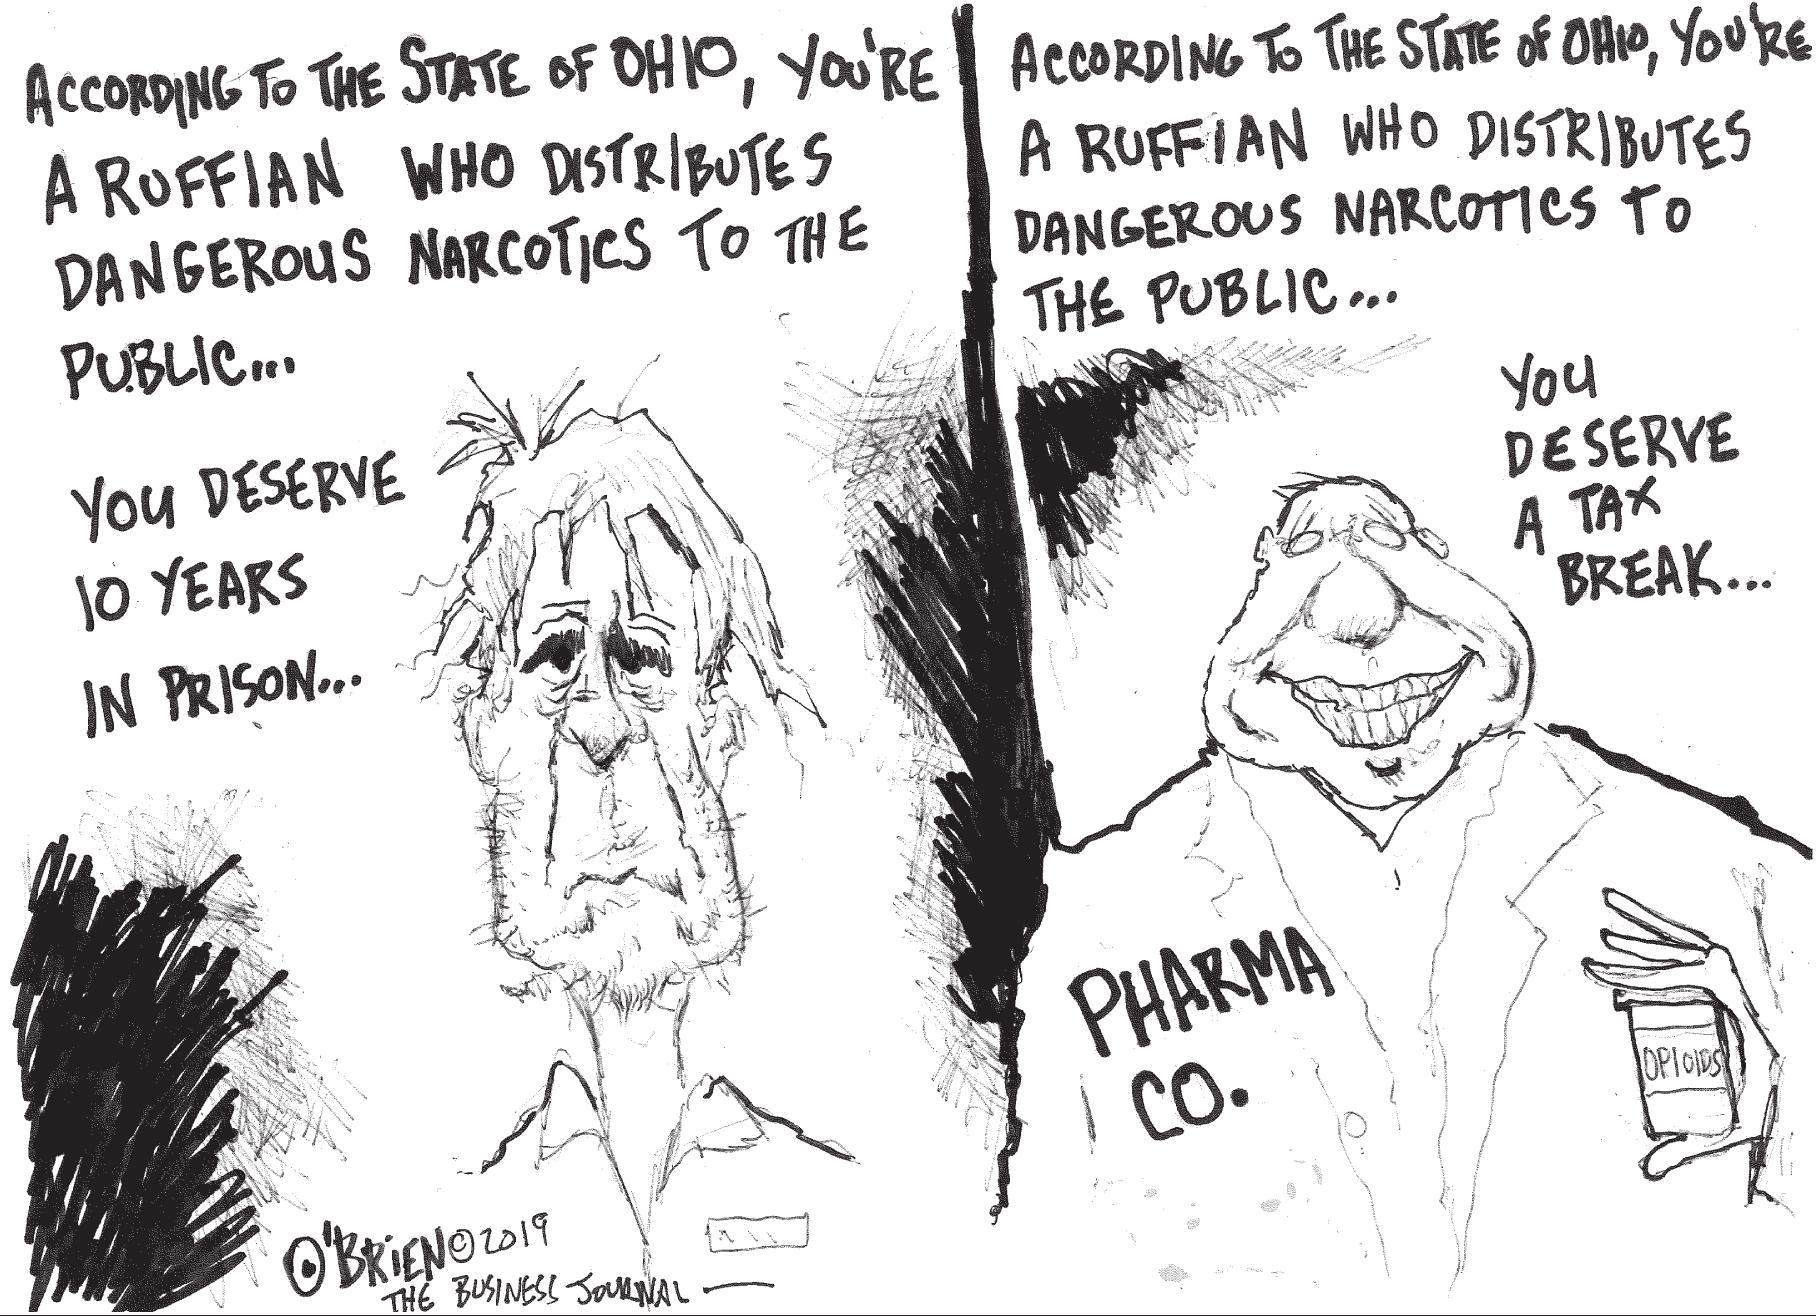 Opioid Crisis Ohio